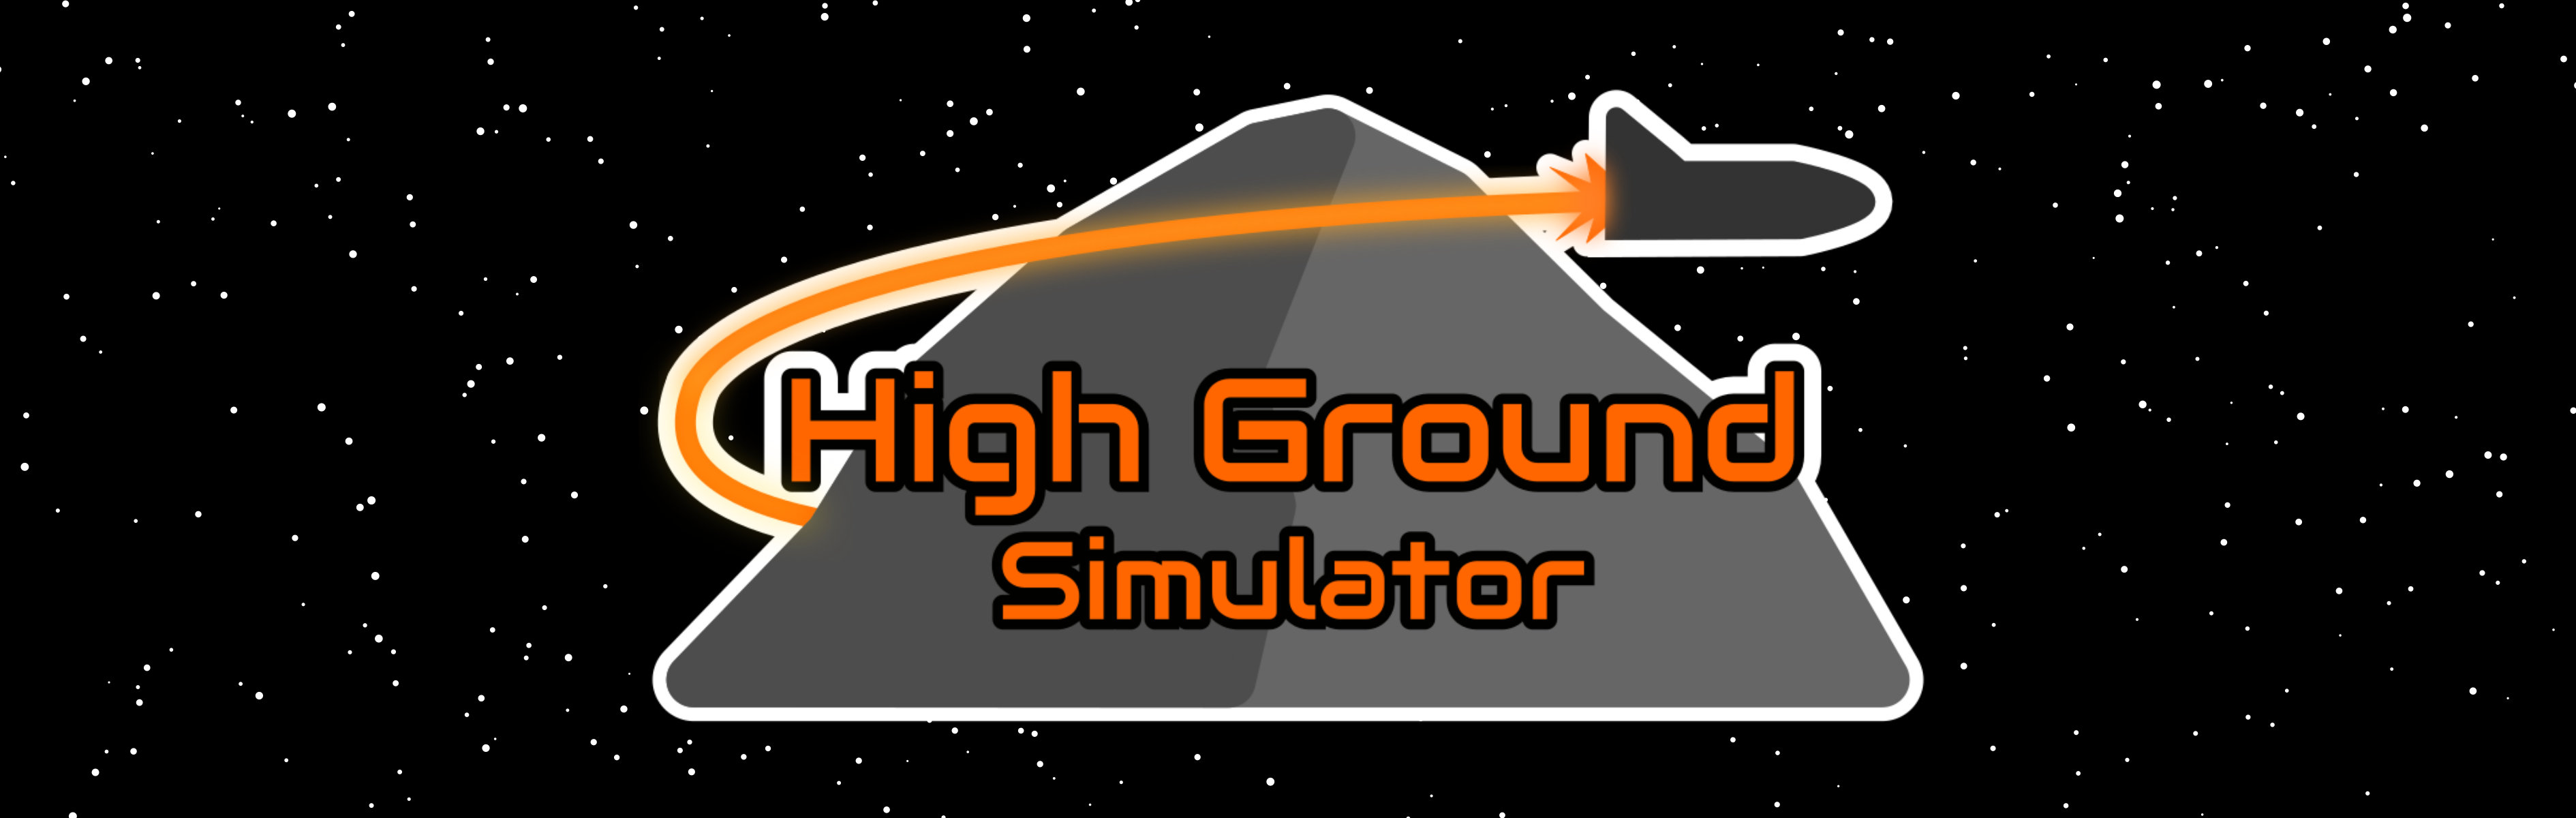 High Ground Simulator